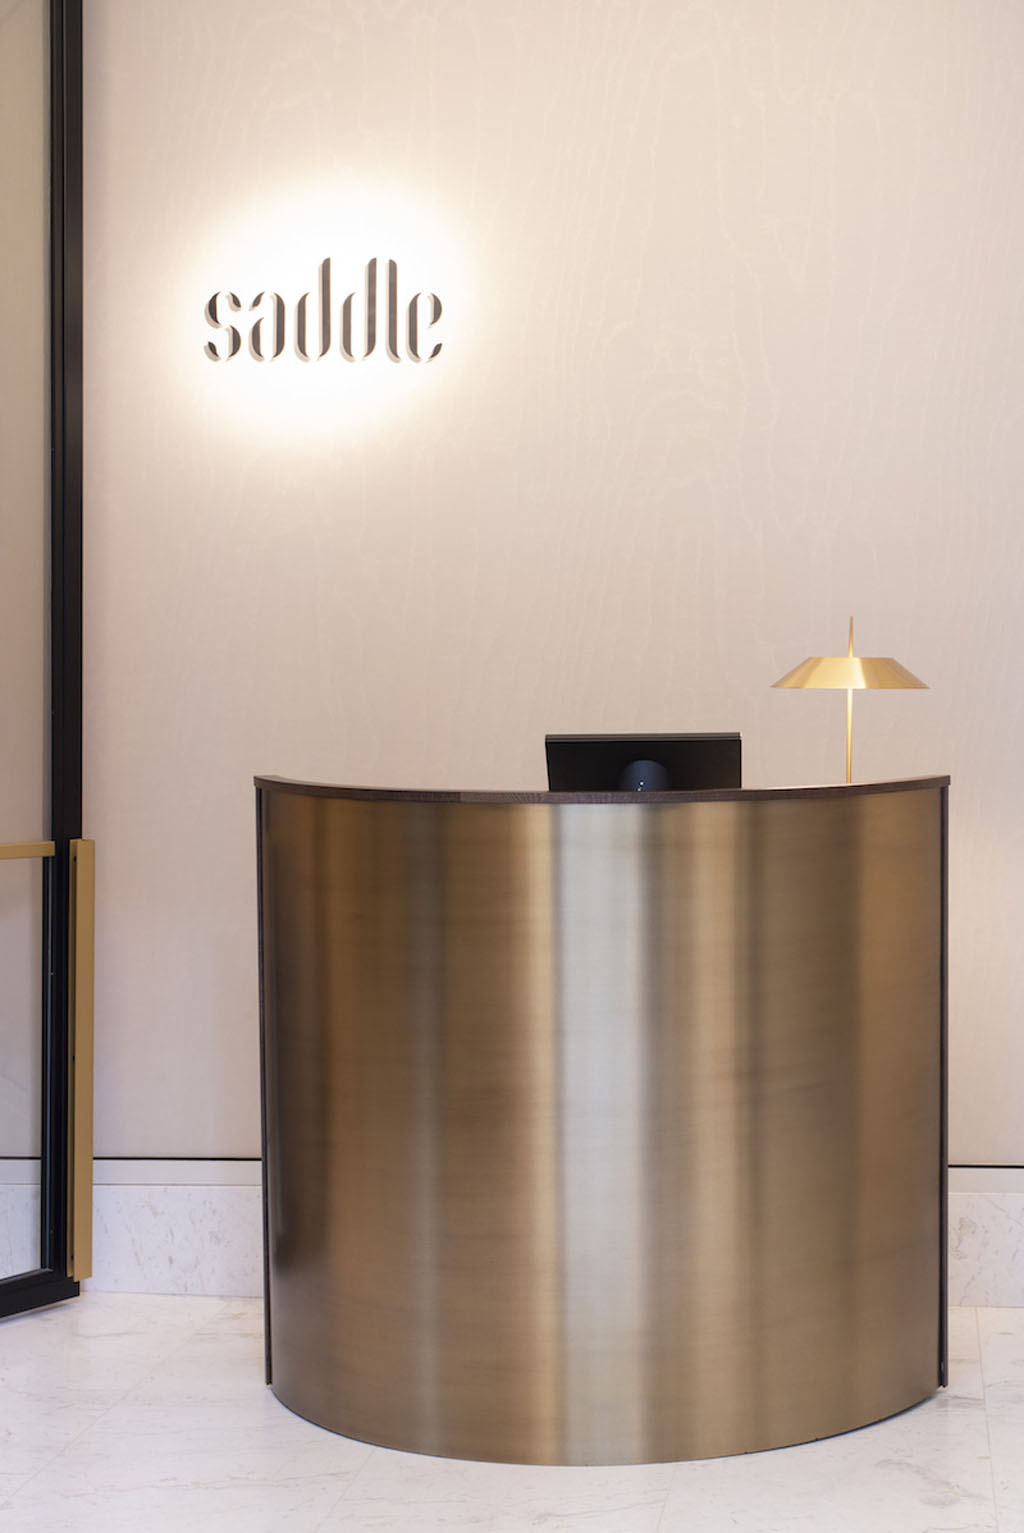 Saddle Restaurante, Madrid